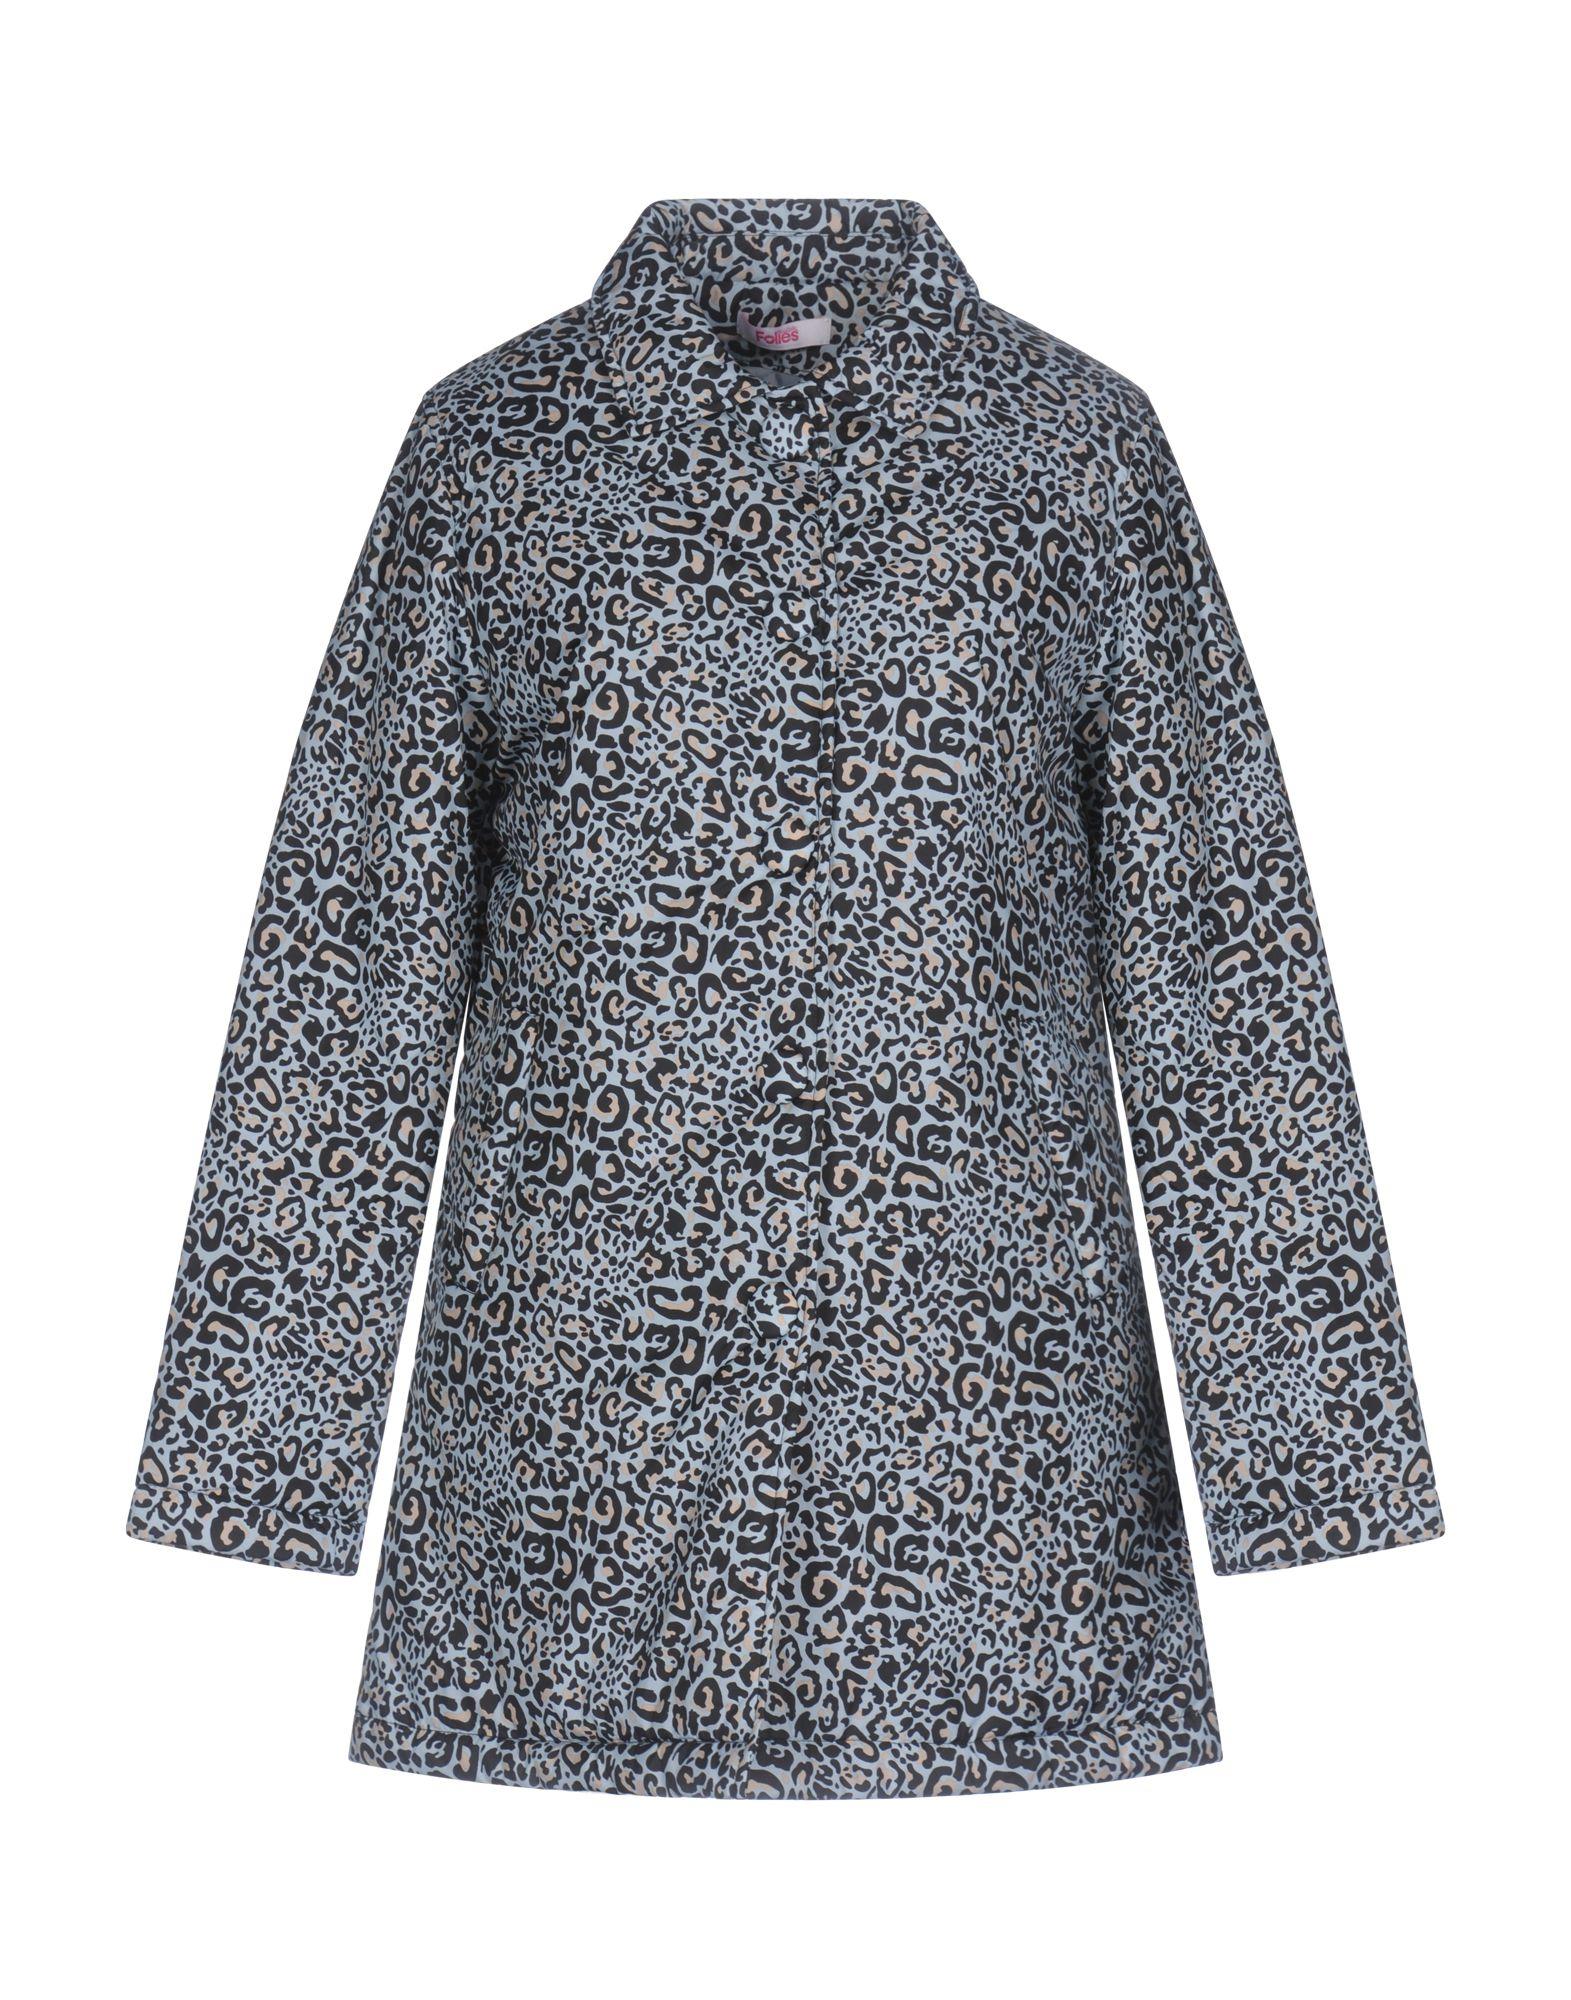 BLUGIRL BLUMARINE Легкое пальто vicolo легкое пальто